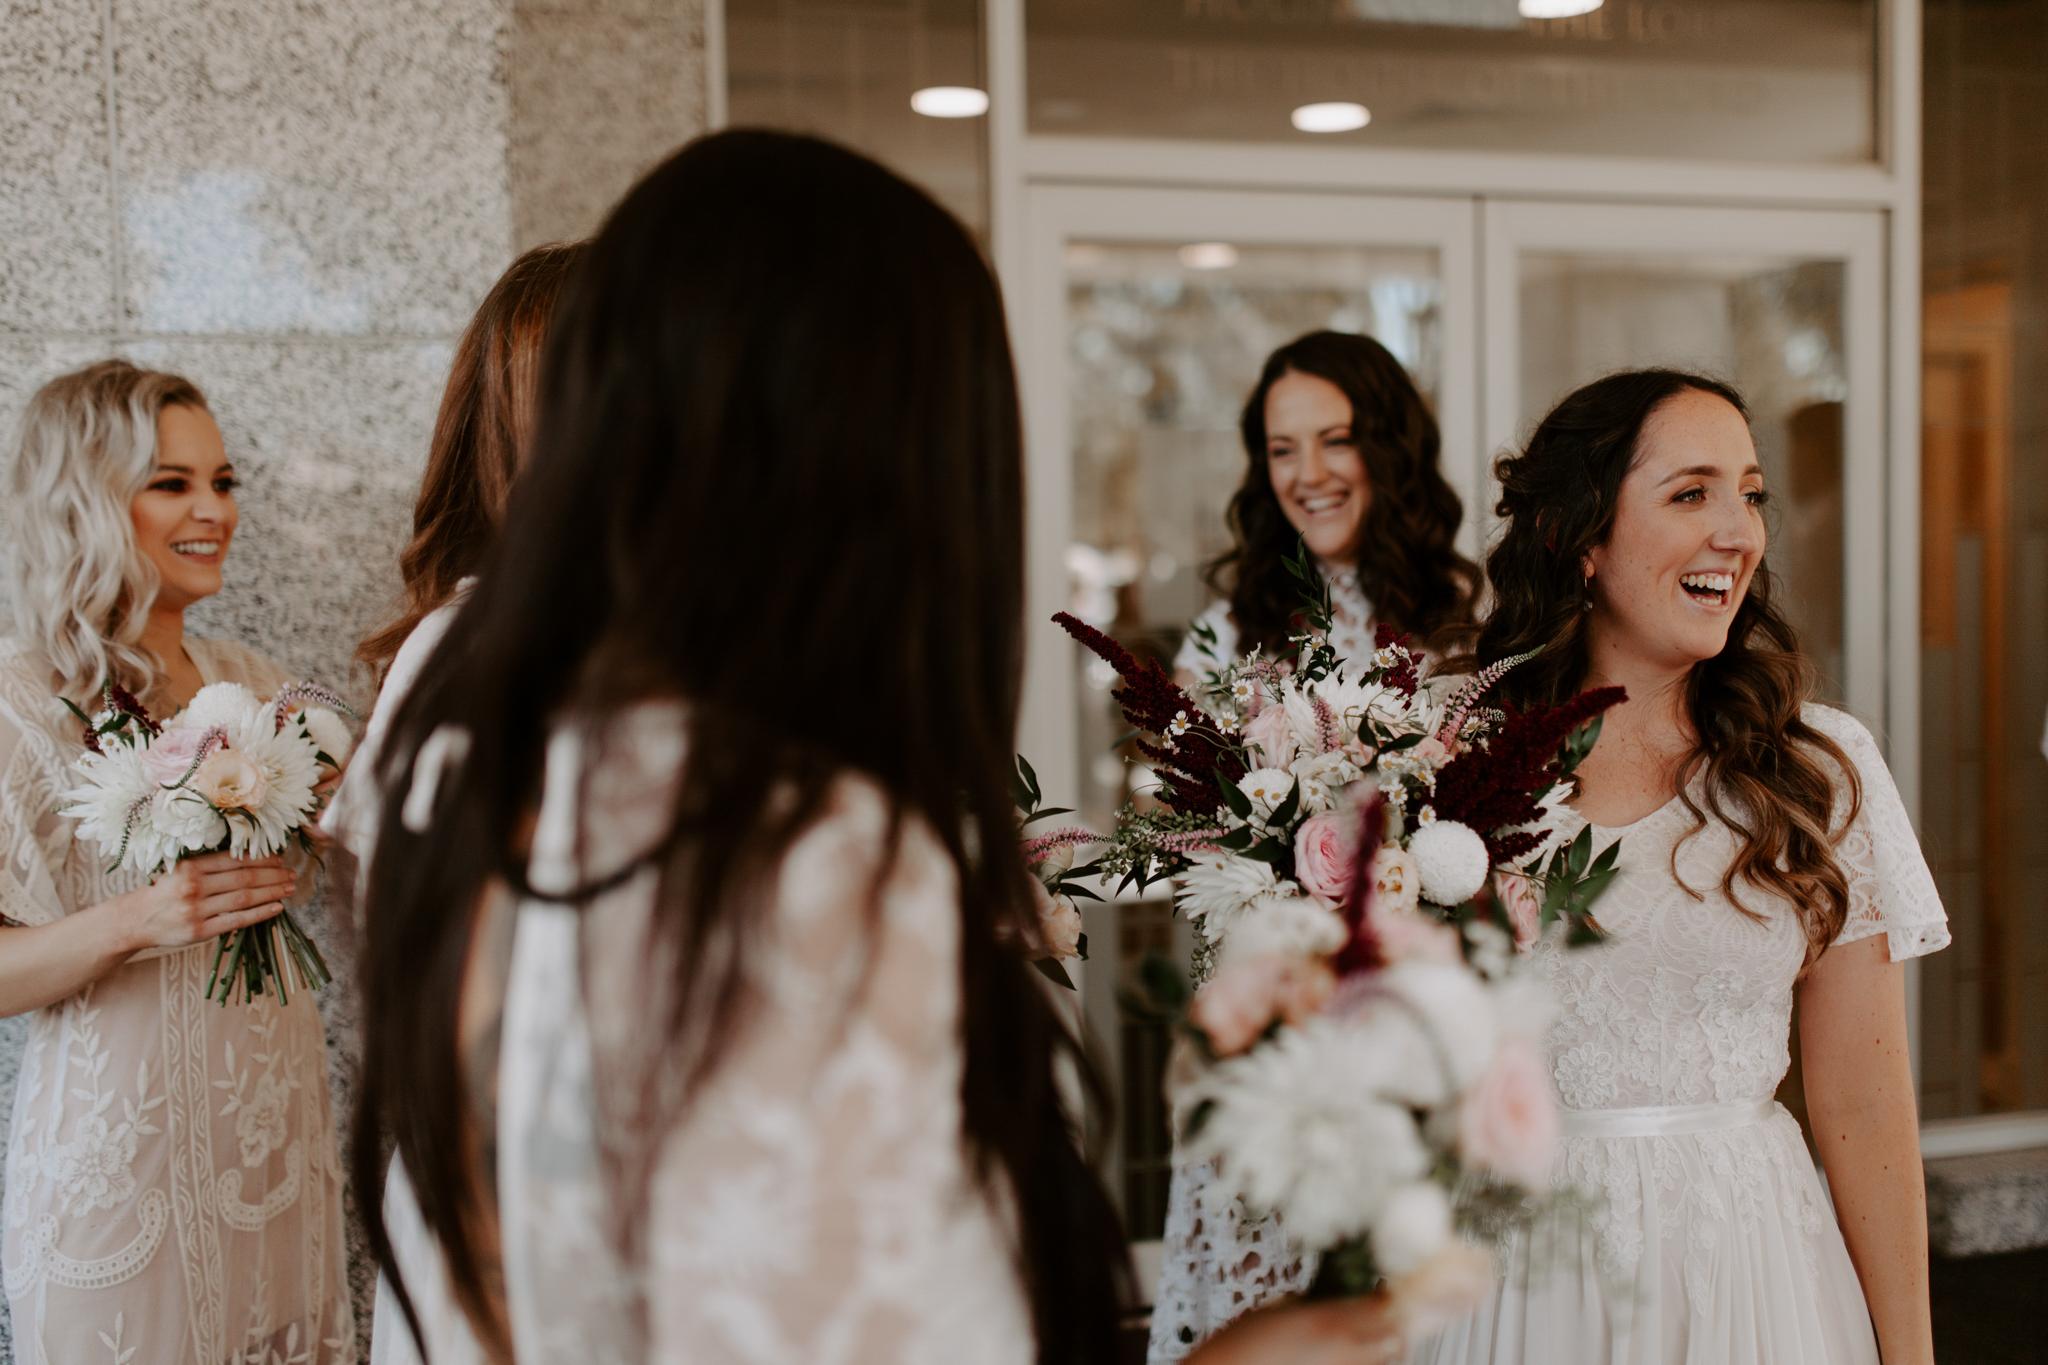 Panama-Dining-Room-wedding-emotionsandmath-005.jpg